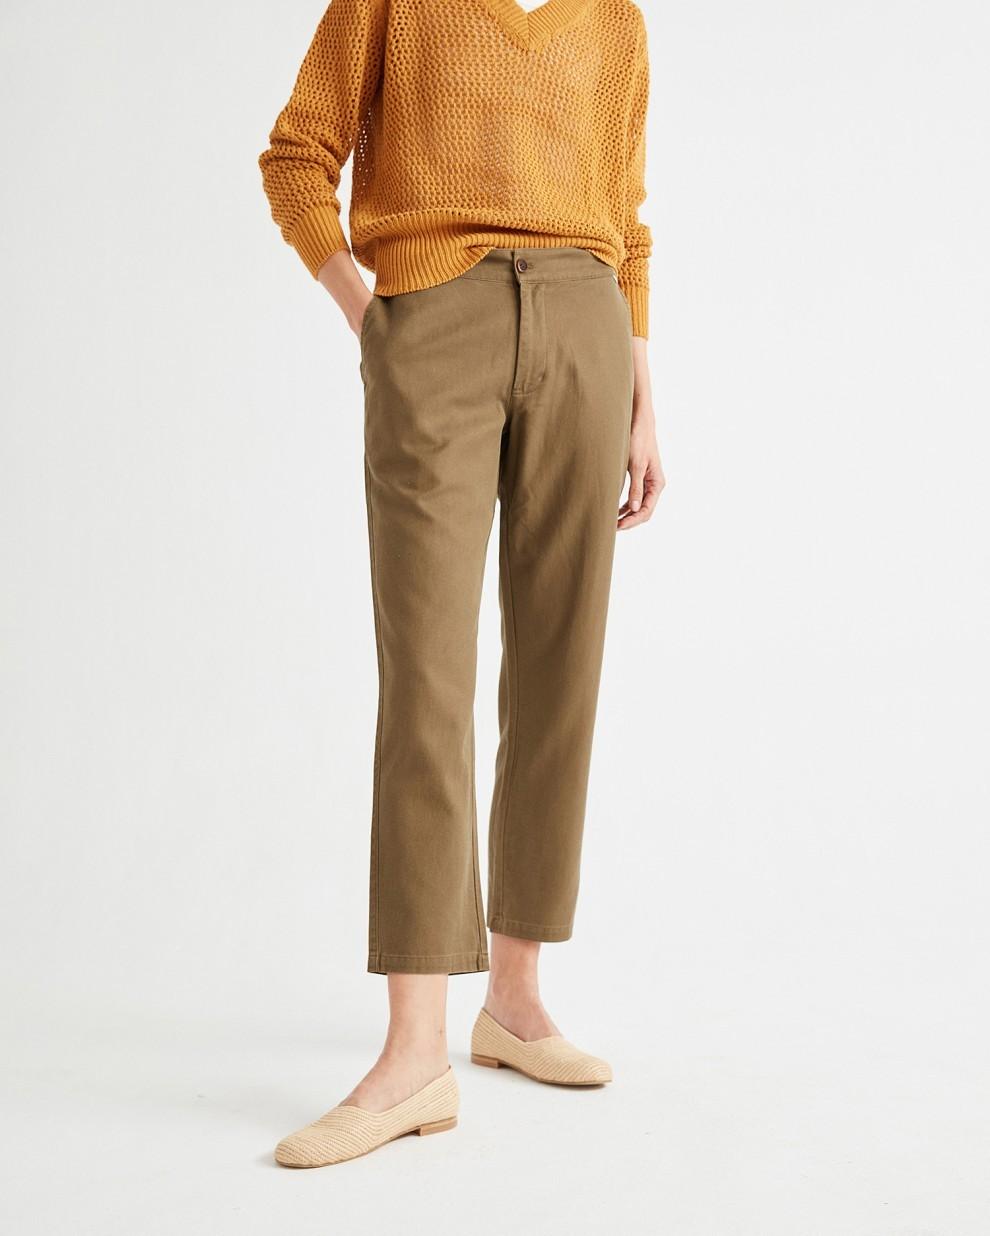 GREEN HEMP DAFHNE PANTS